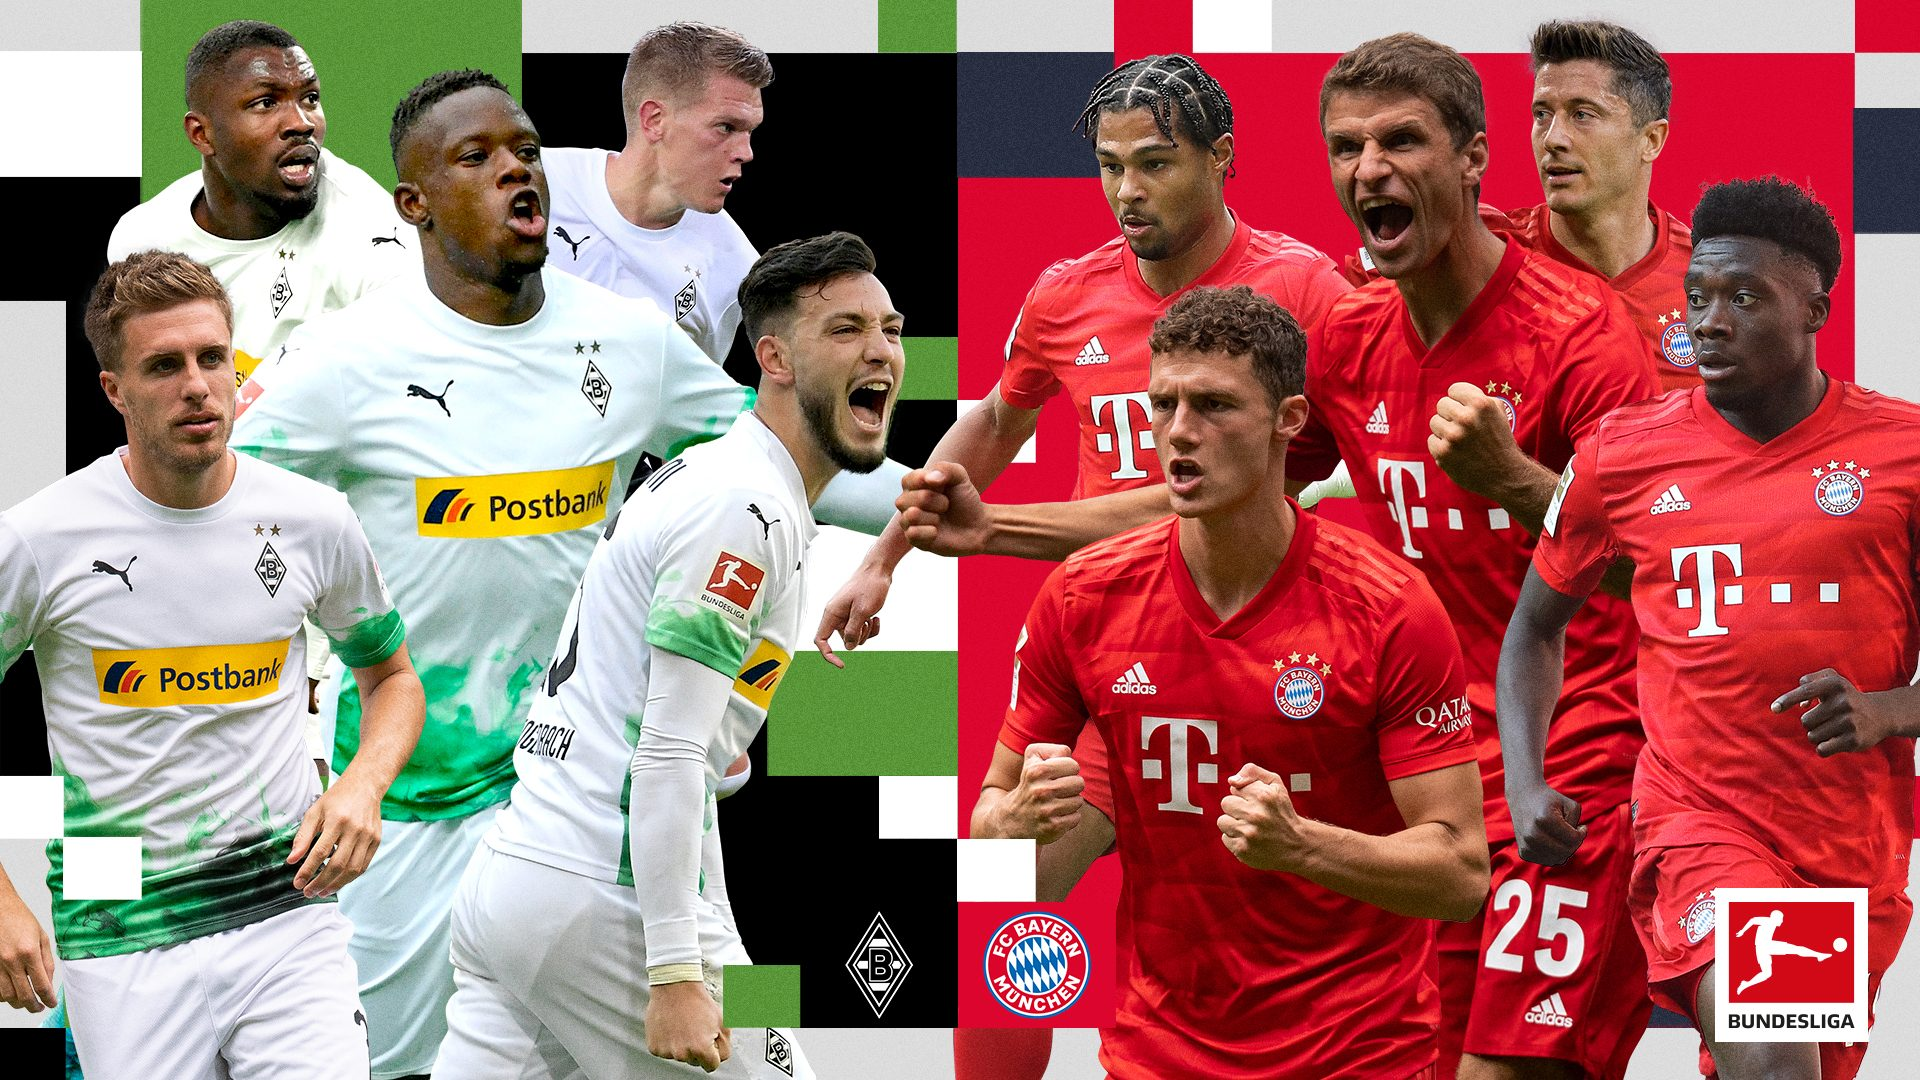 M'gladbach vs Bayern Munich Full Match & Highlights 13 August 2021